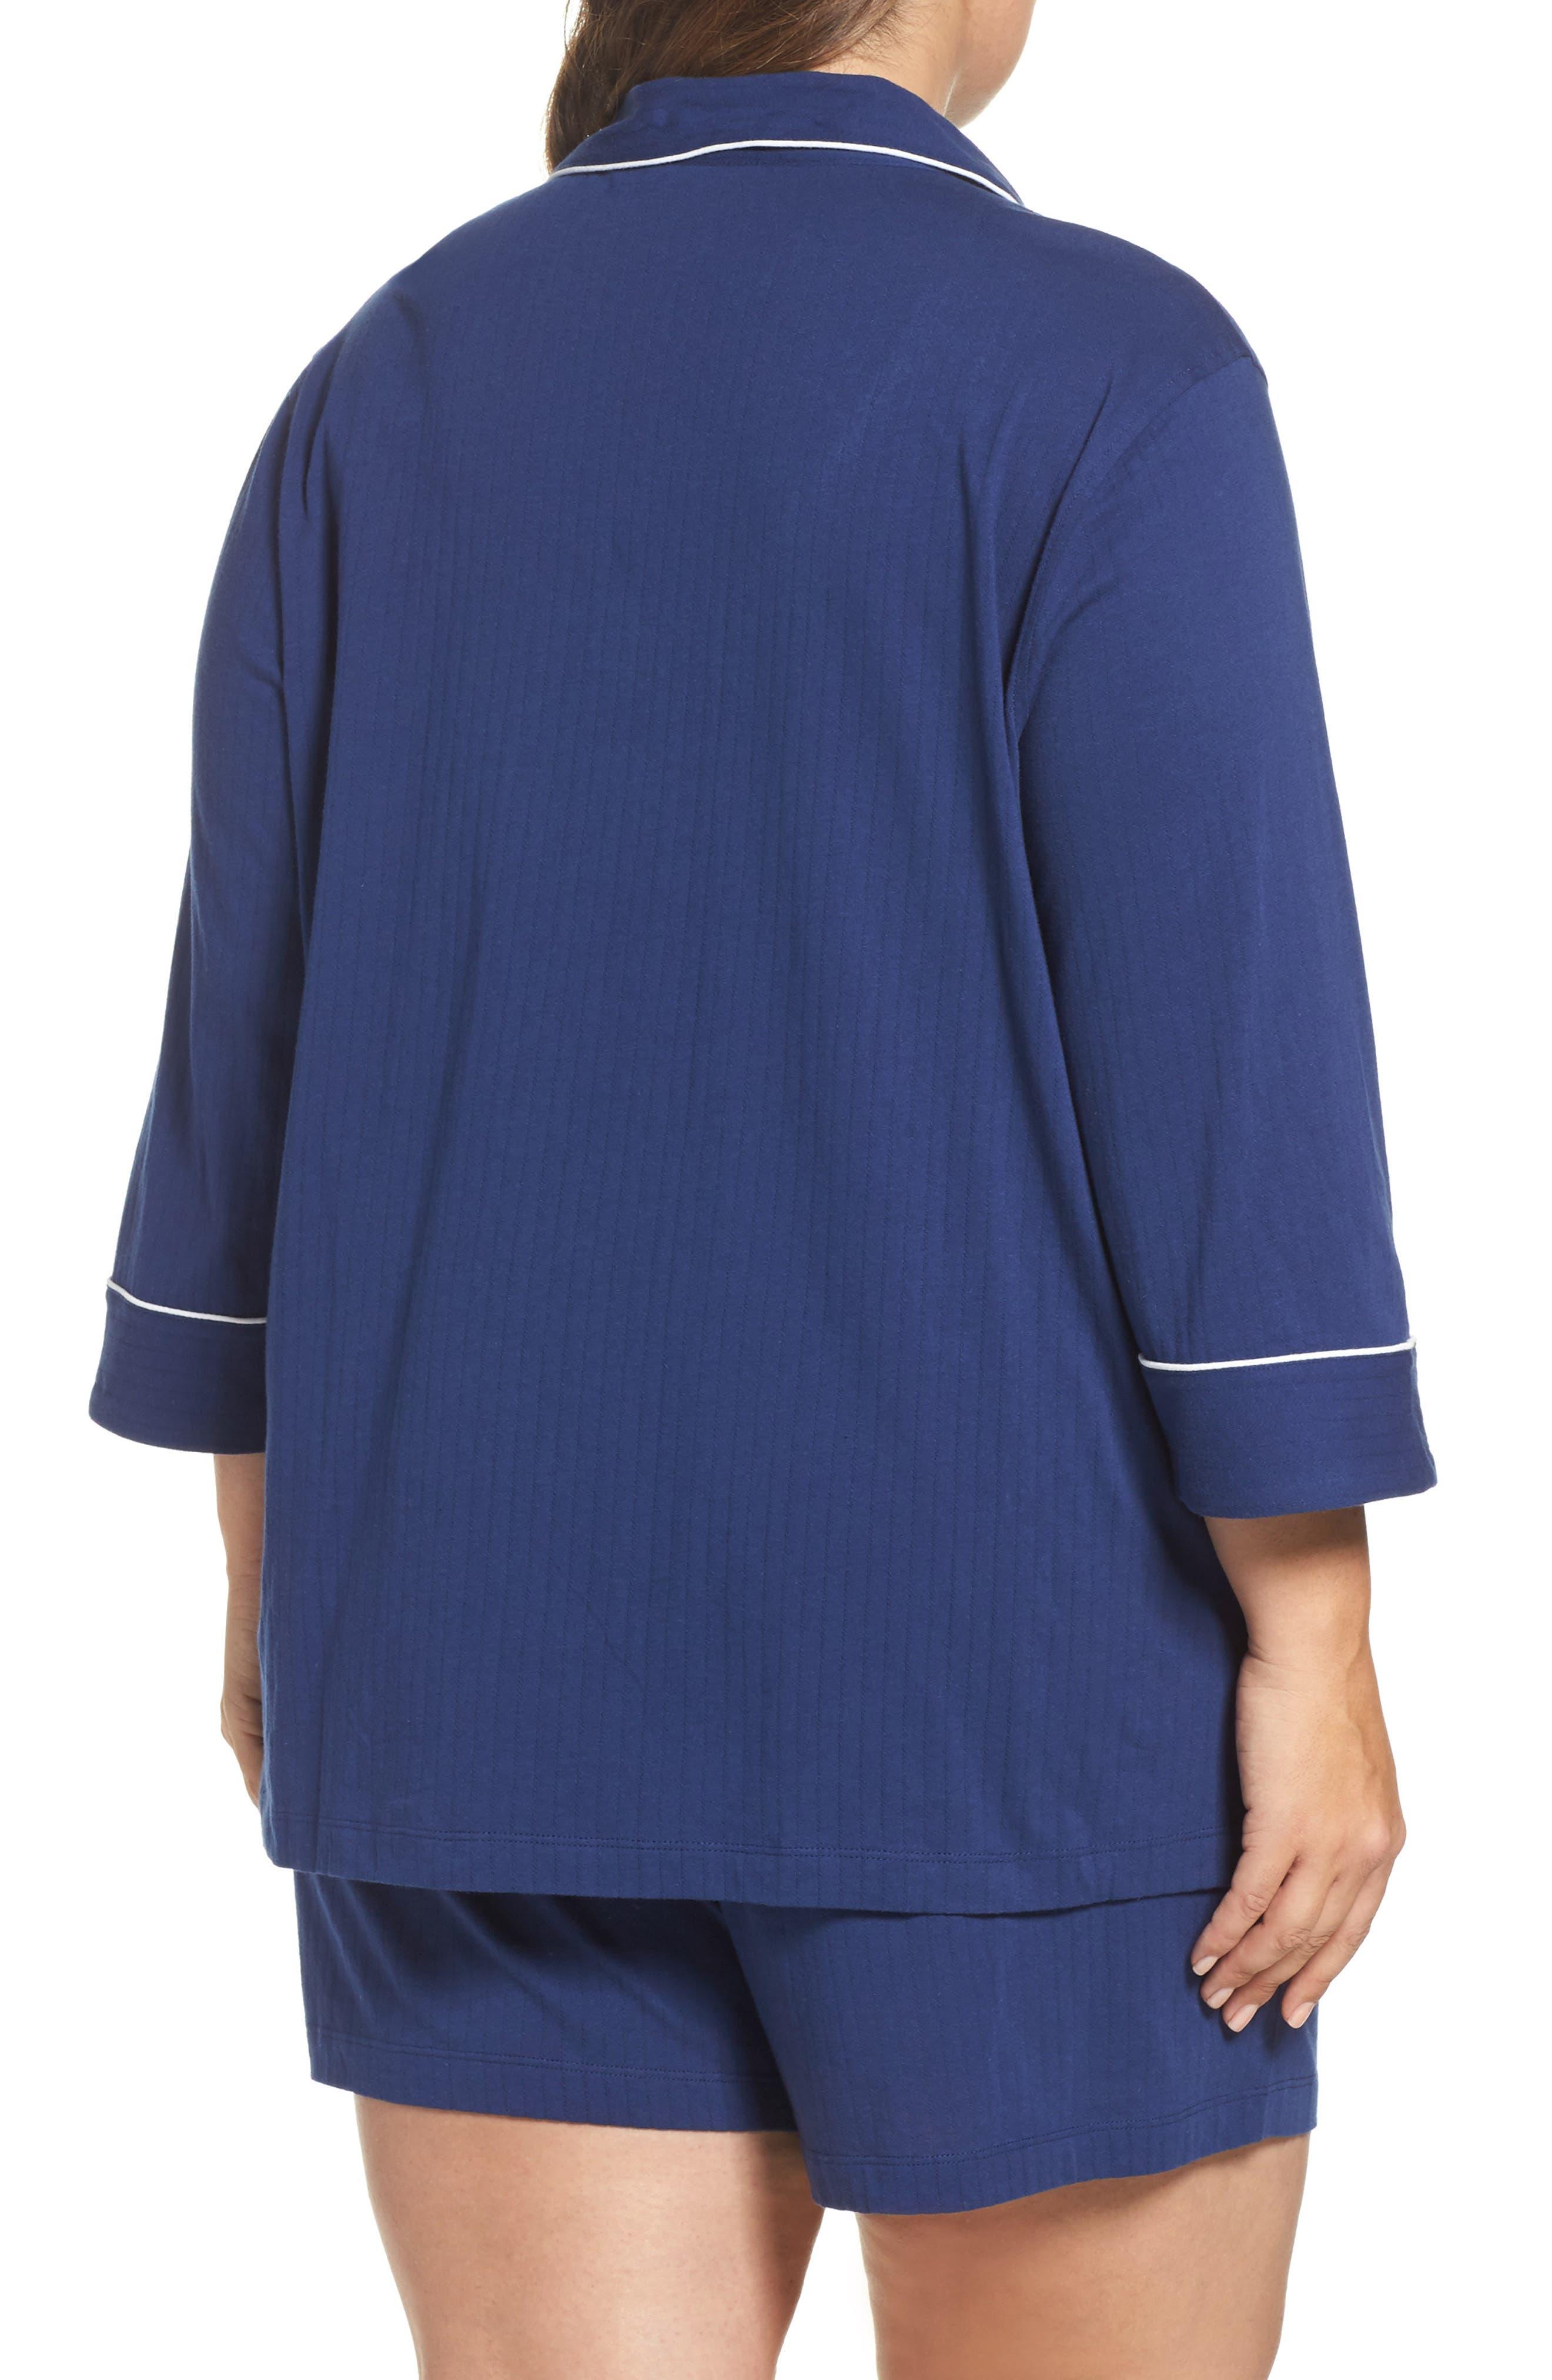 Notched Collar Pajamas,                             Alternate thumbnail 2, color,                             Navy